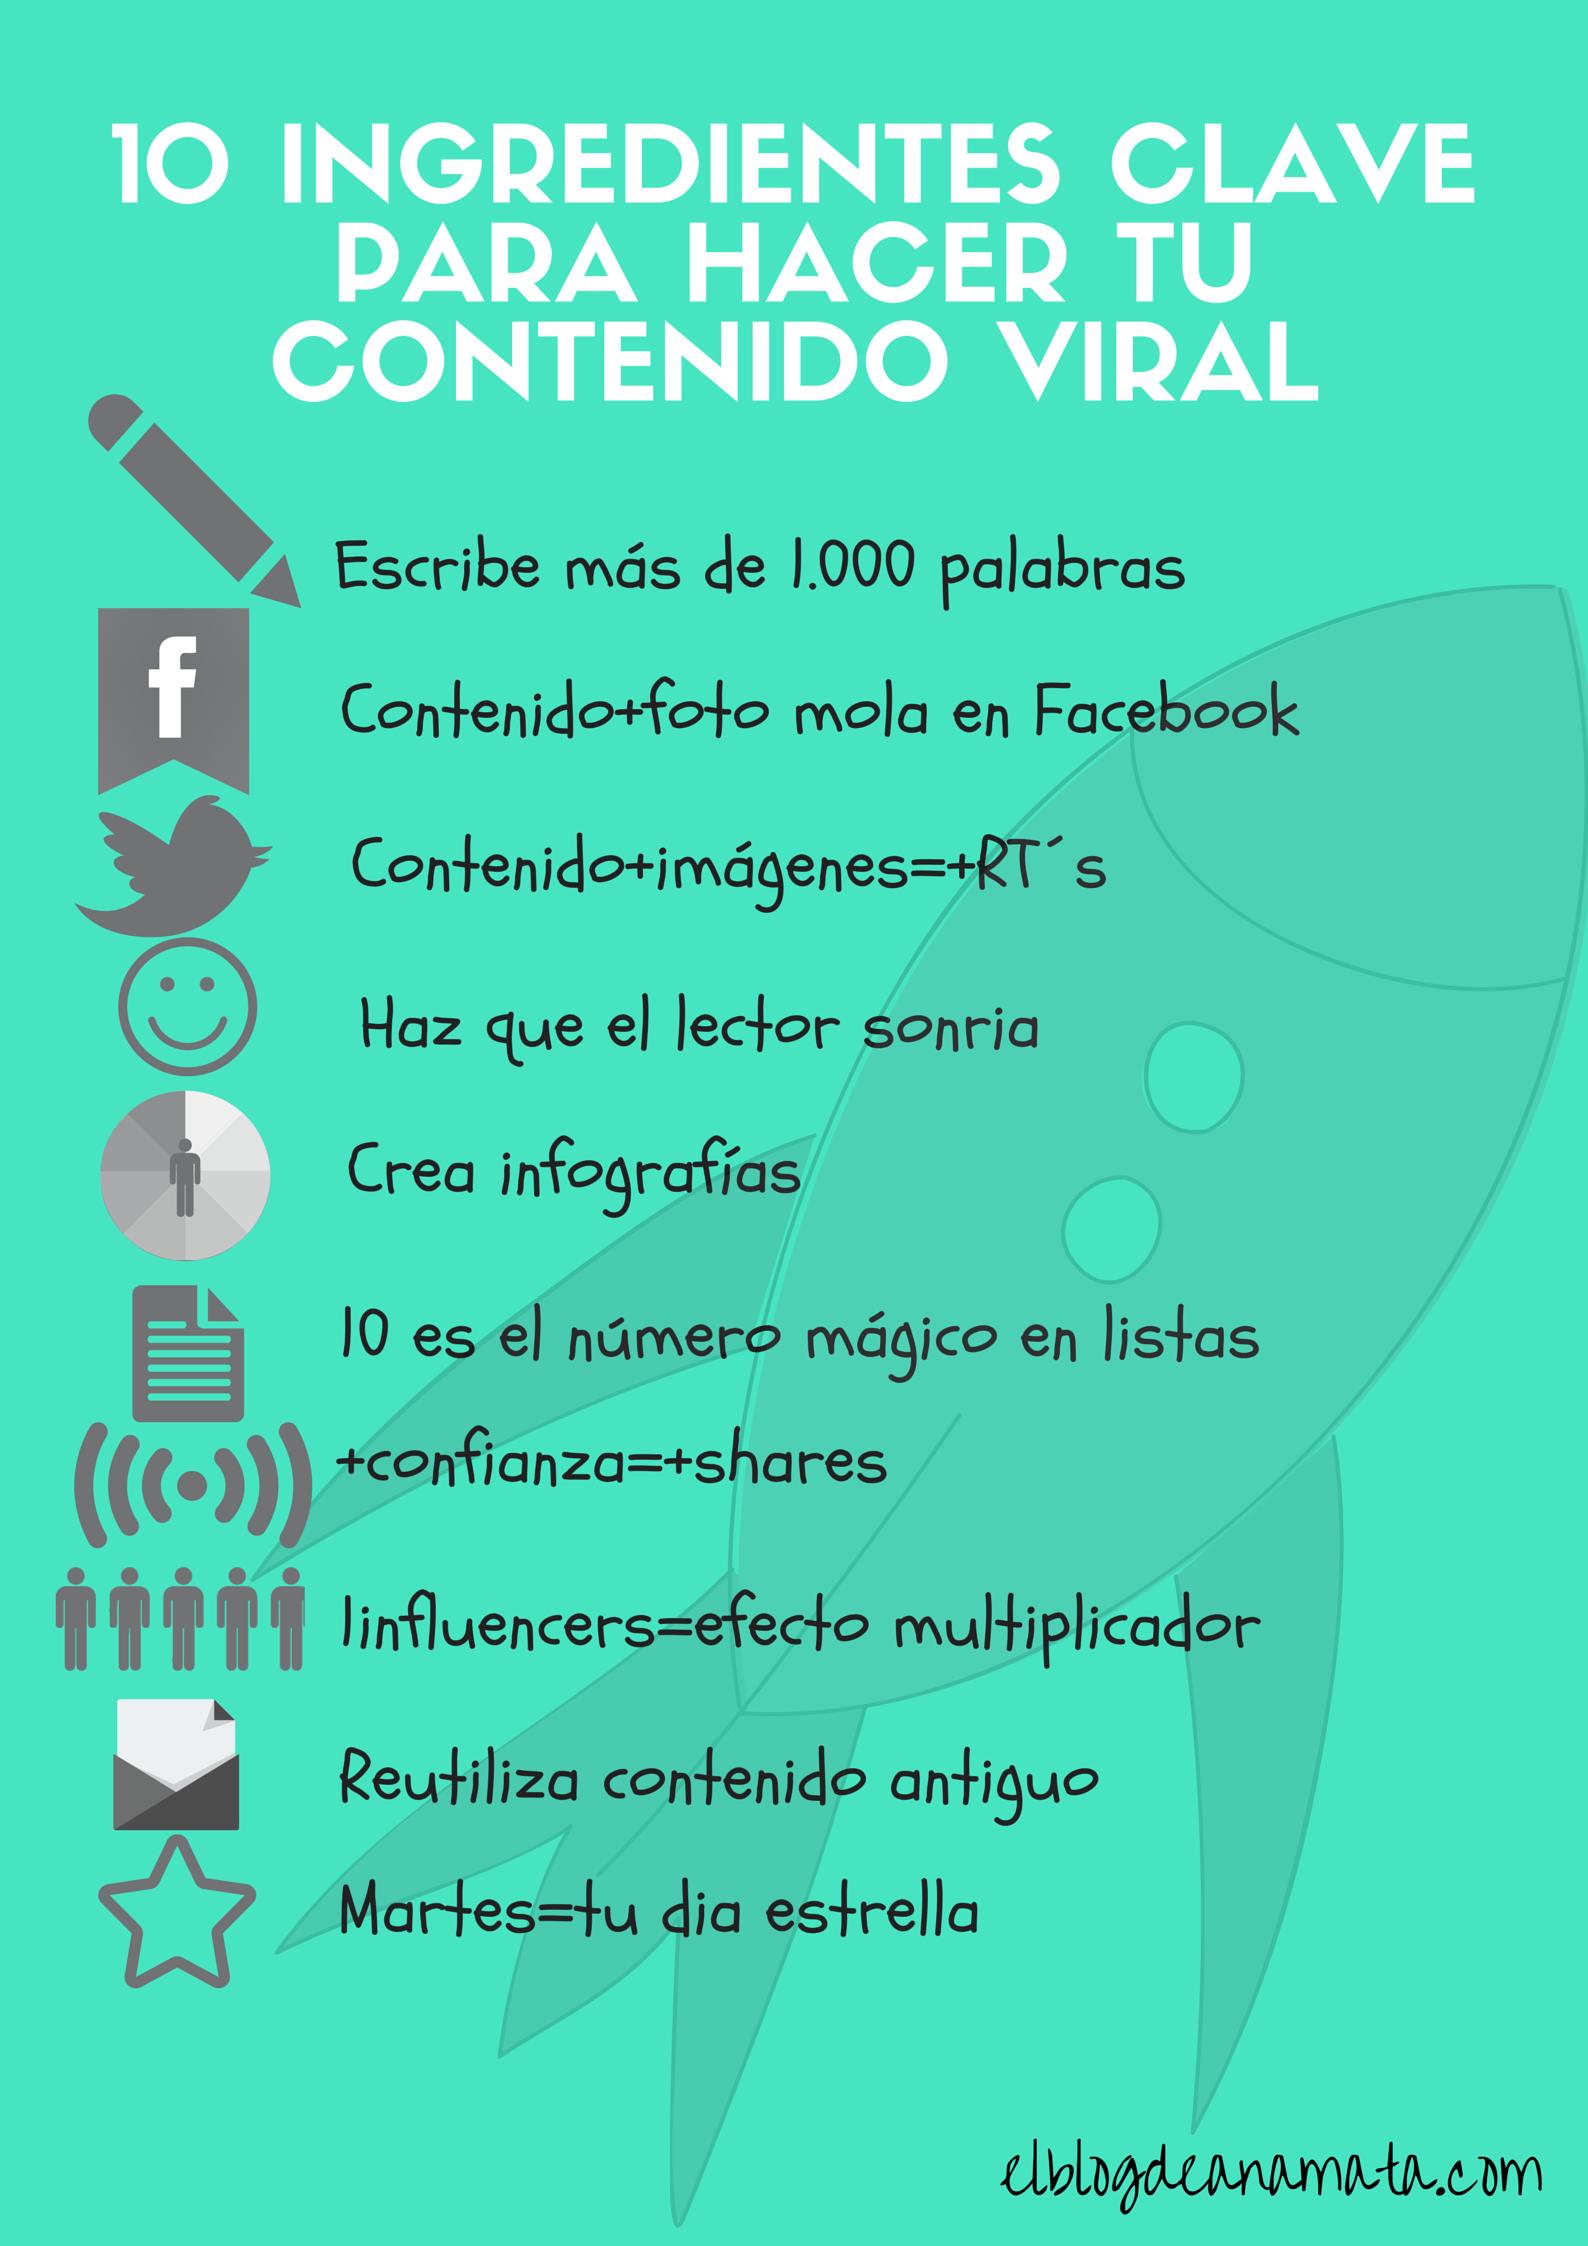 10 Ingredientes clave para hacer tu contenido viral - INFOGRAFIA